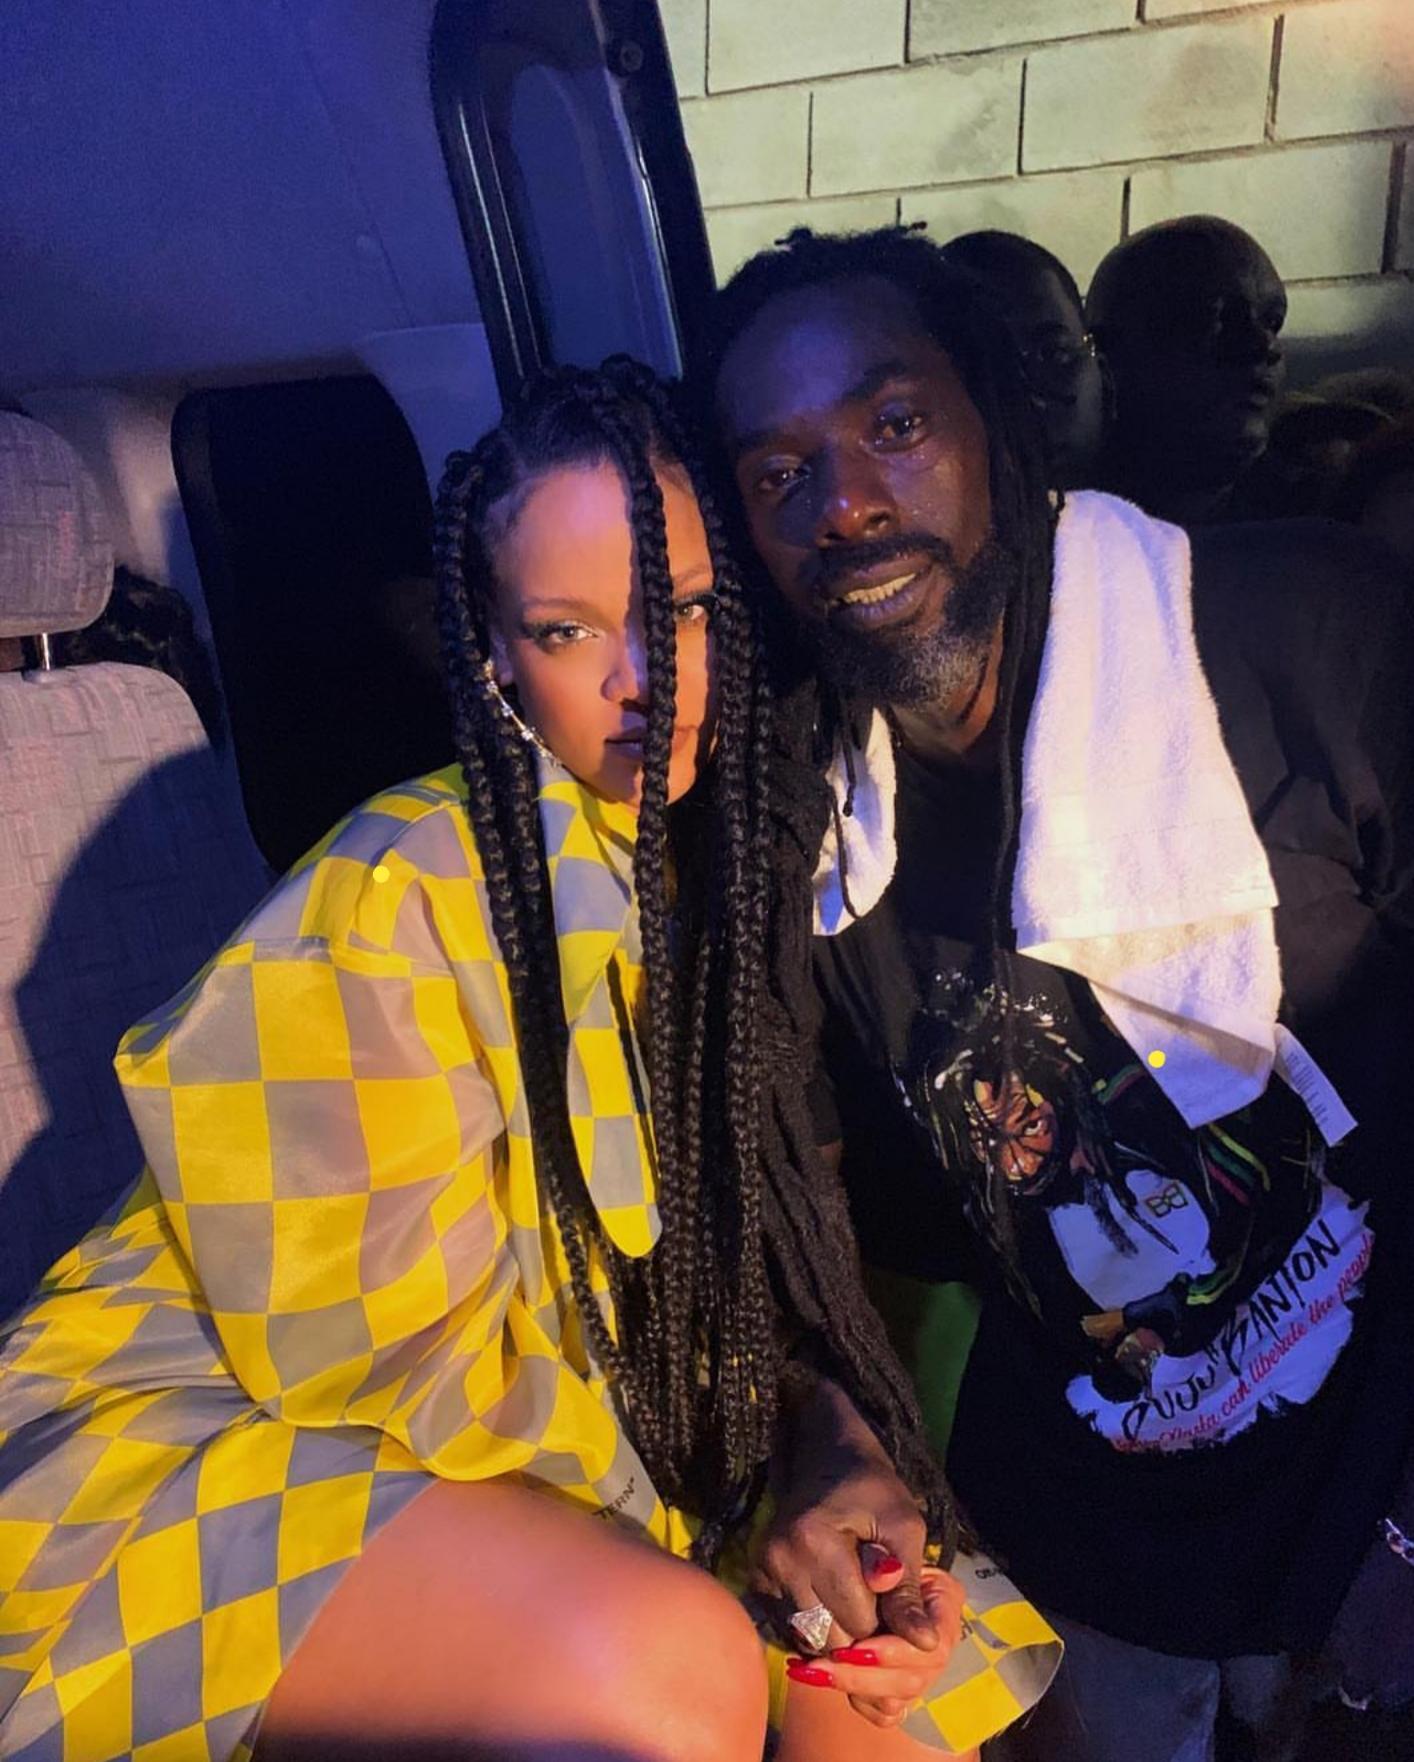 Buju Banton and Rihanna recently posing in a photo at his Concert in Barbados /@badgalriri Instagram